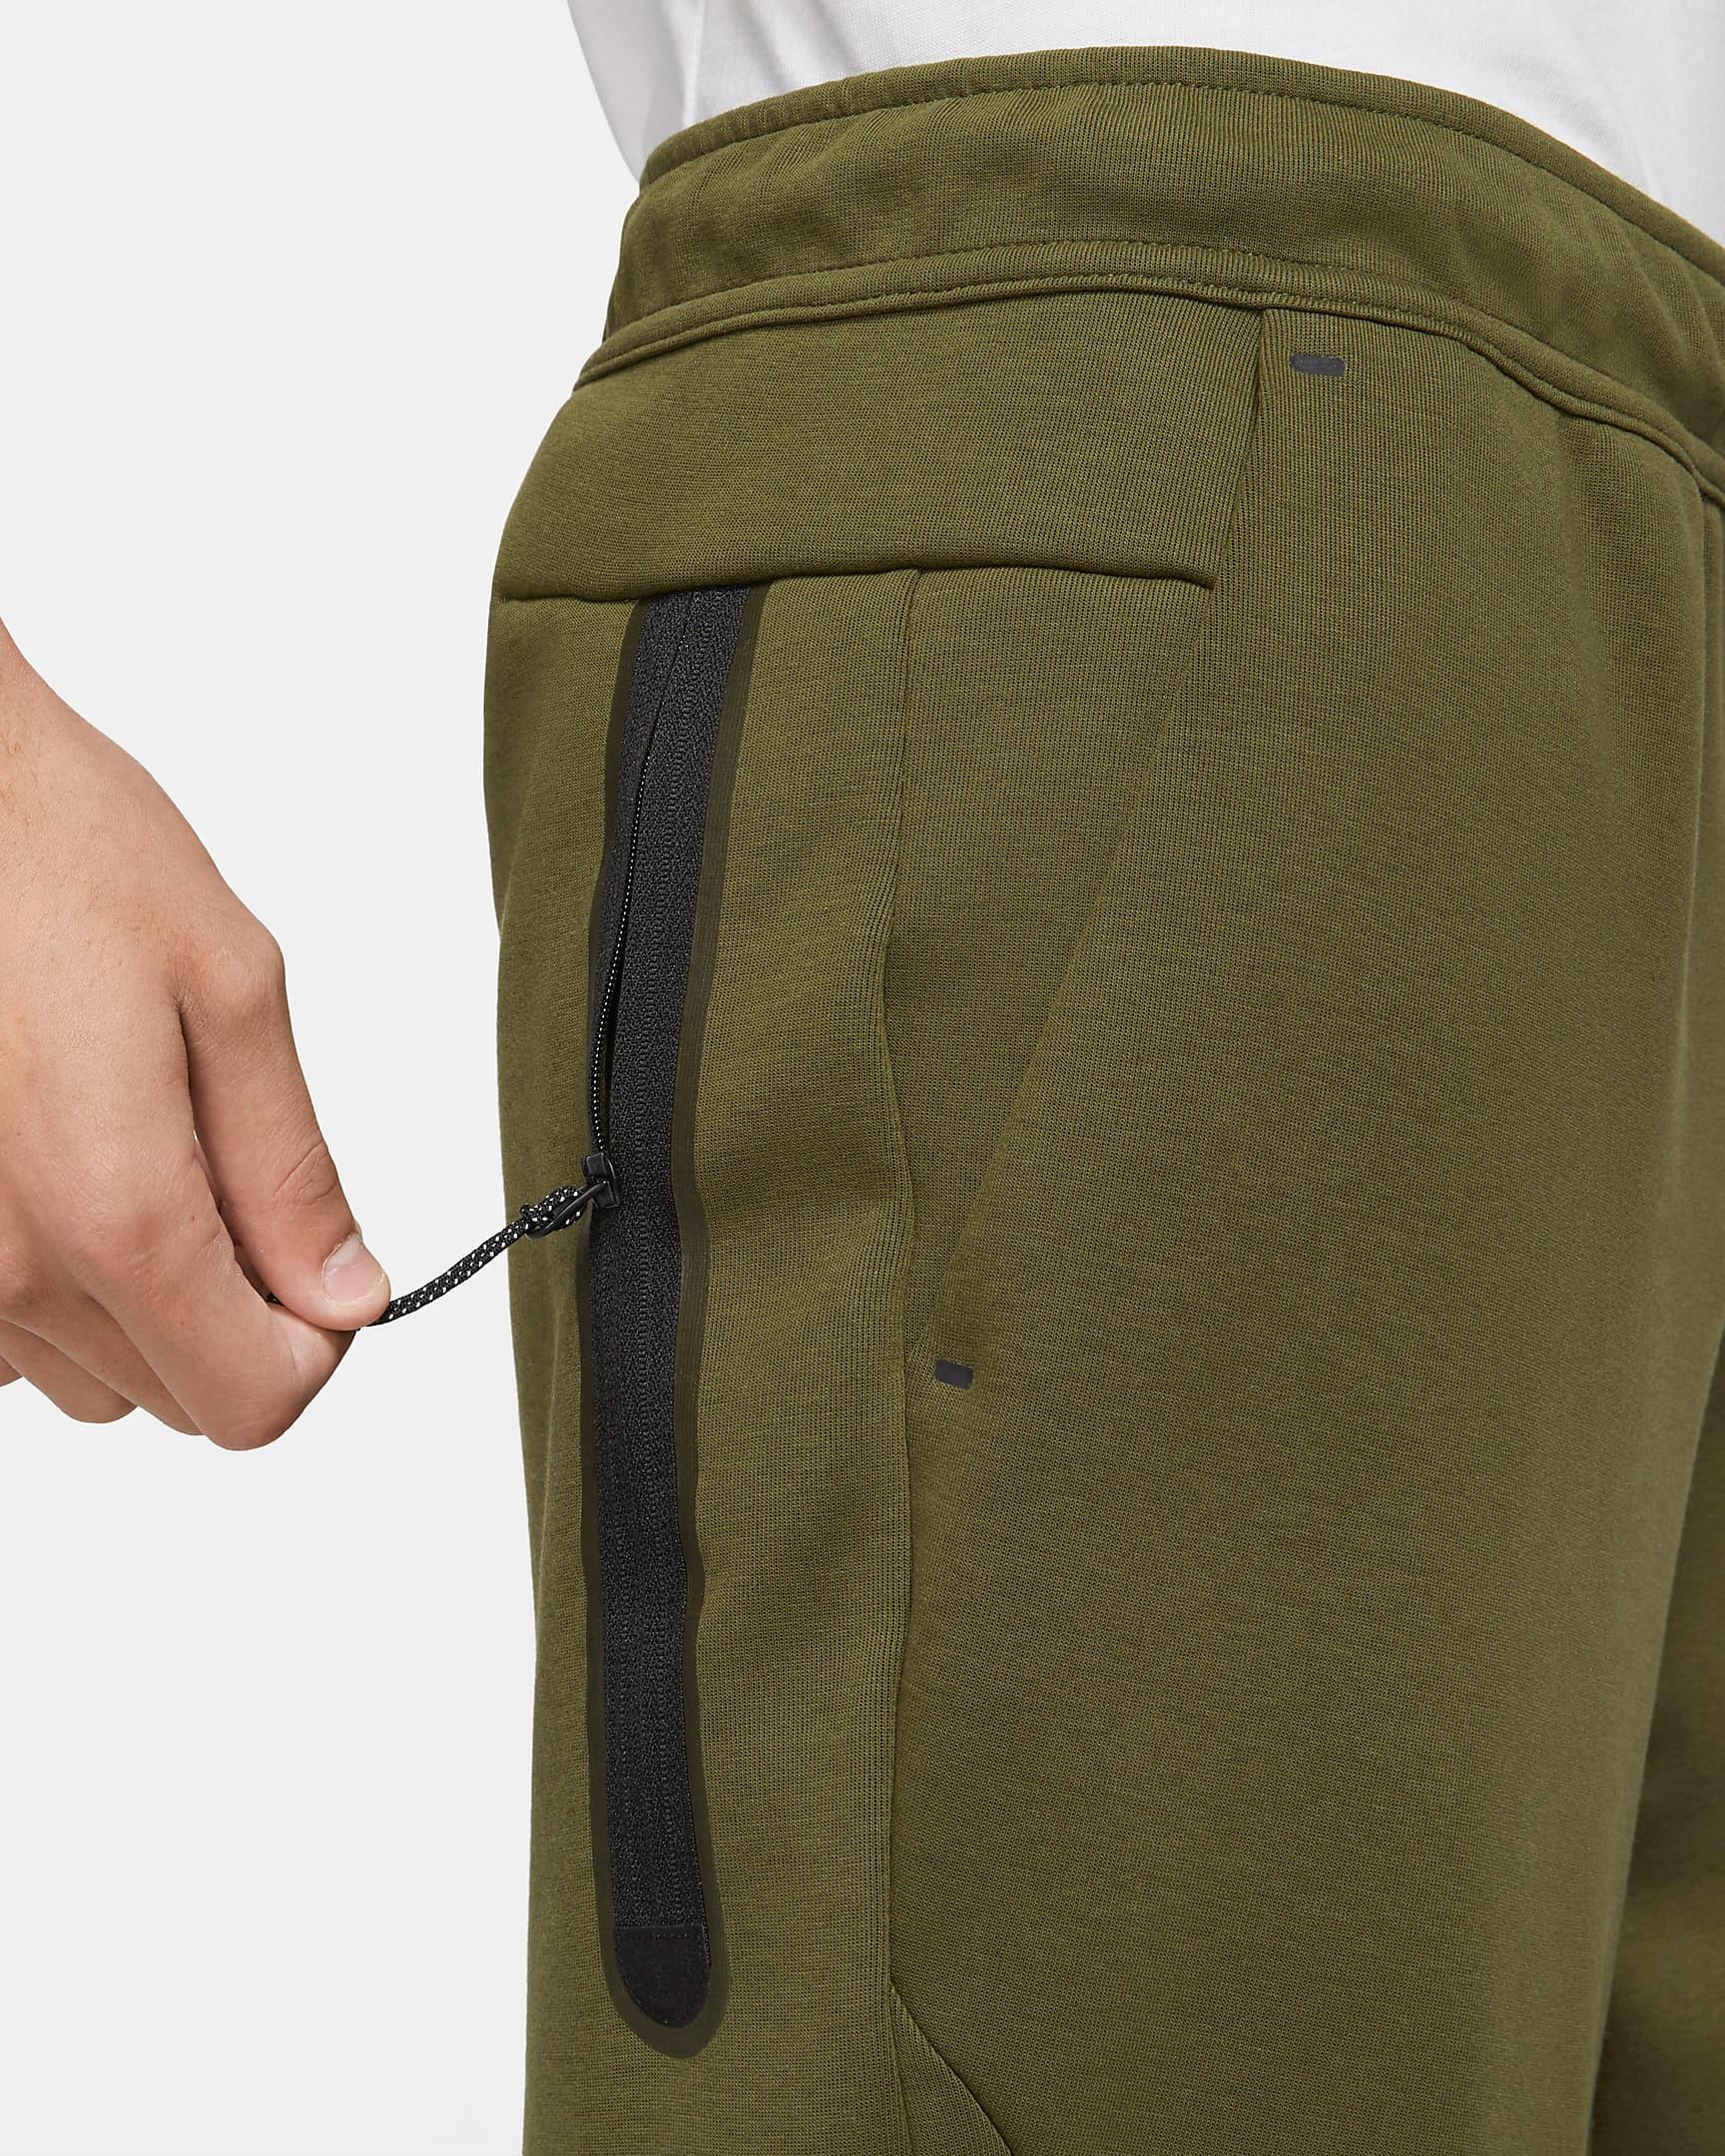 nike-rough-green-tech-fleece-joggers-pants-3